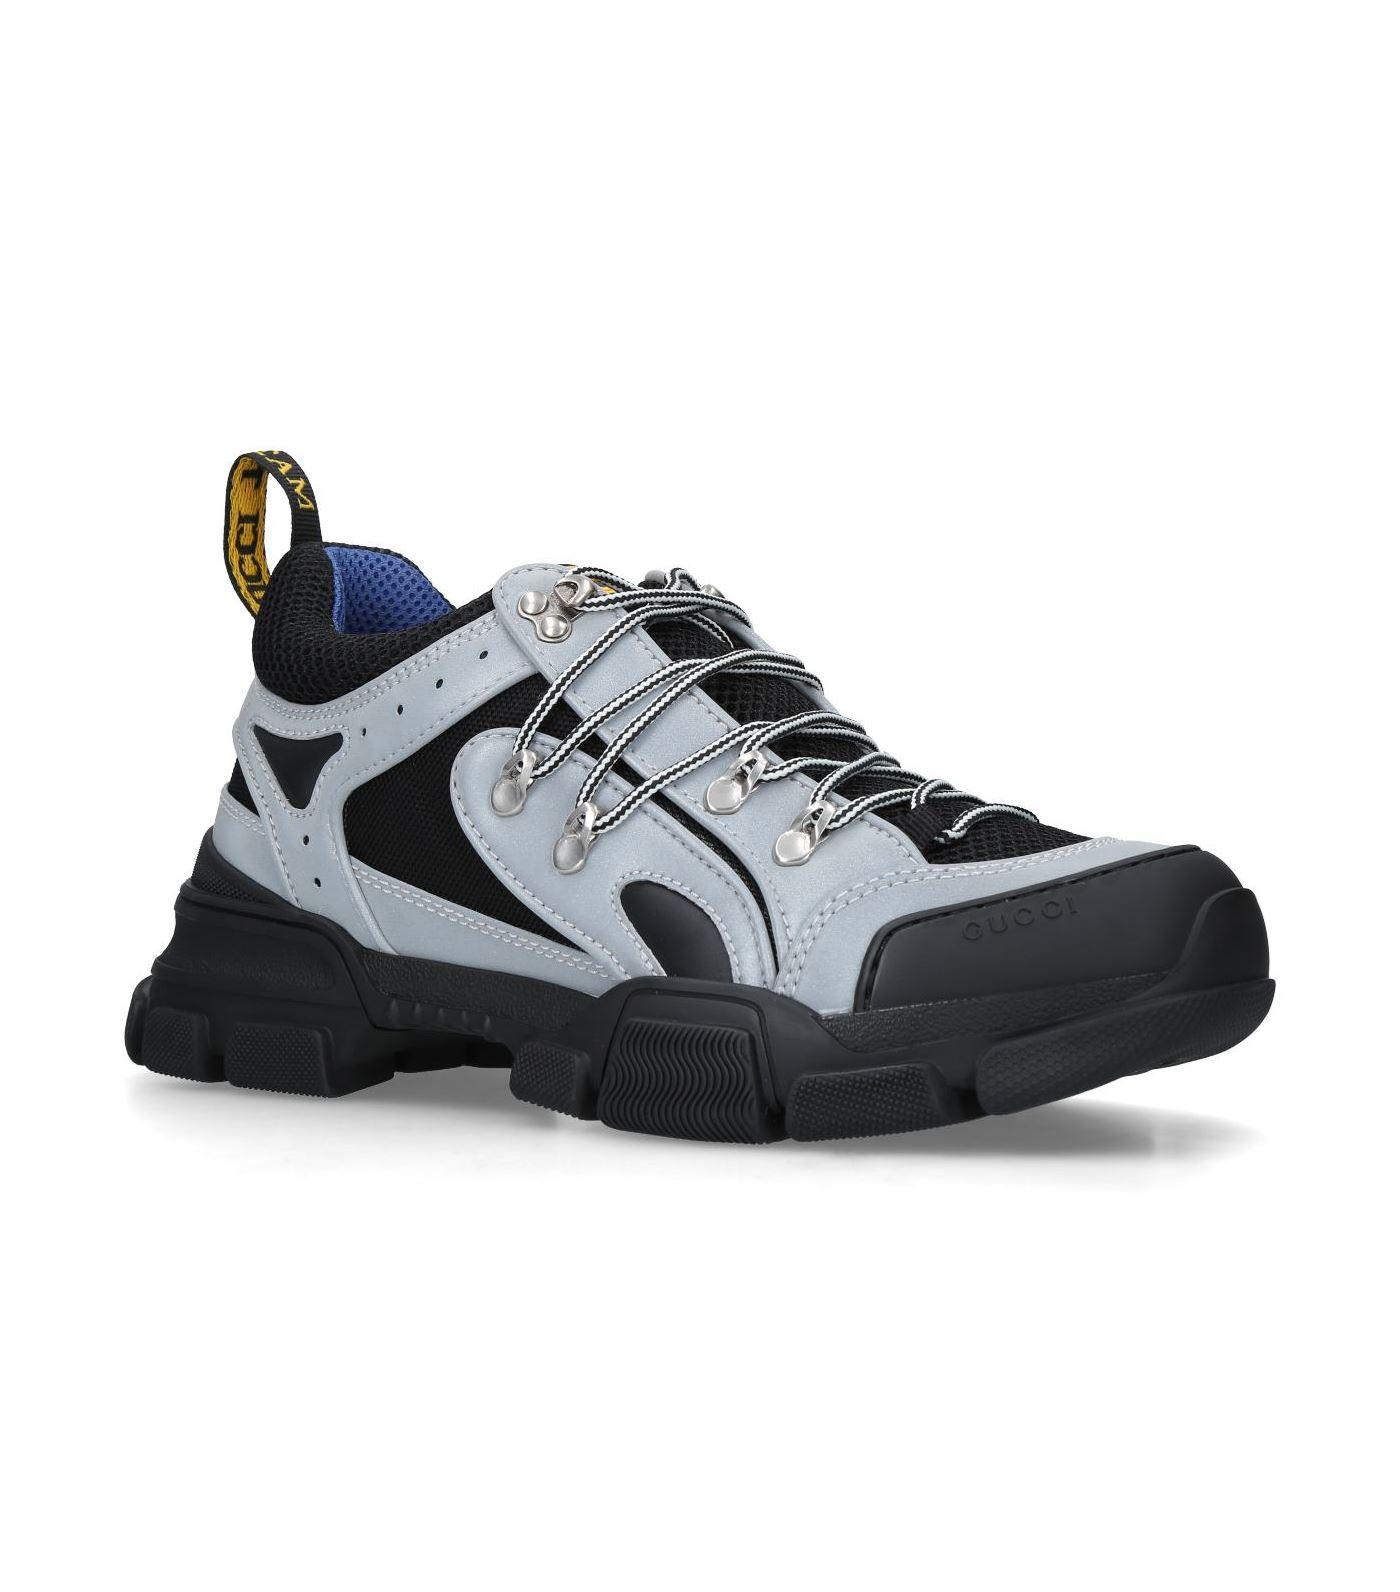 buy online c68ce 5de9c GUCCI FLASHTREK HIKING SNEAKERS.  gucci  shoes   Gucci in 2019 ...